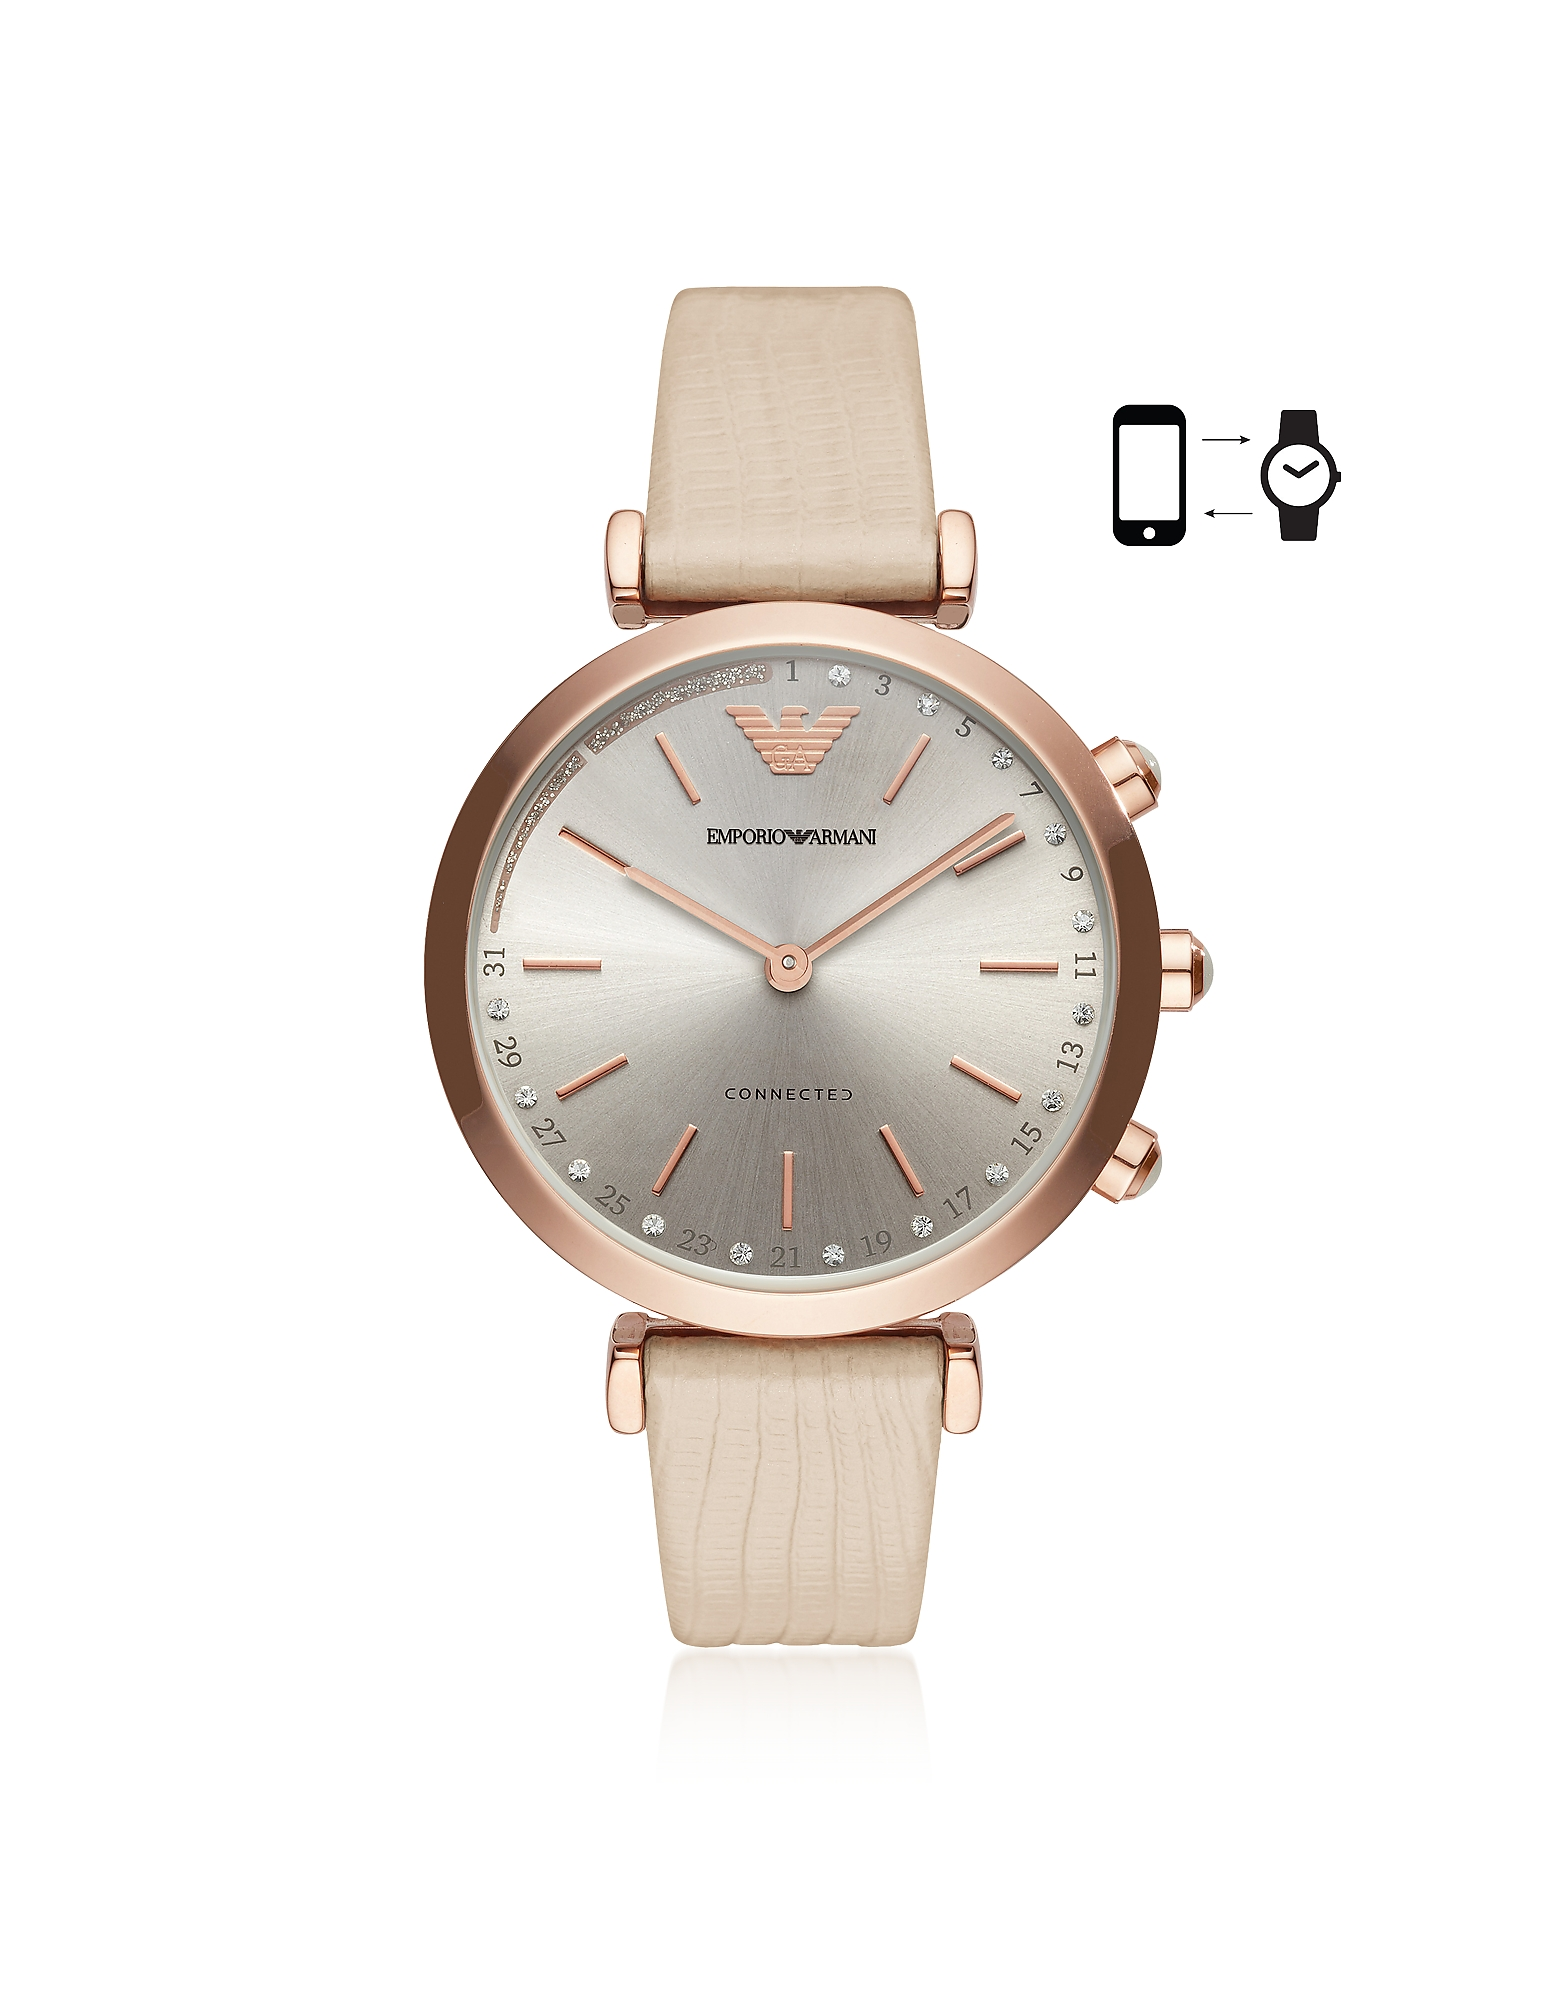 Emporio Armani Women's Watches, Emporio Armani Connected Women's Hybrid Smartwatch